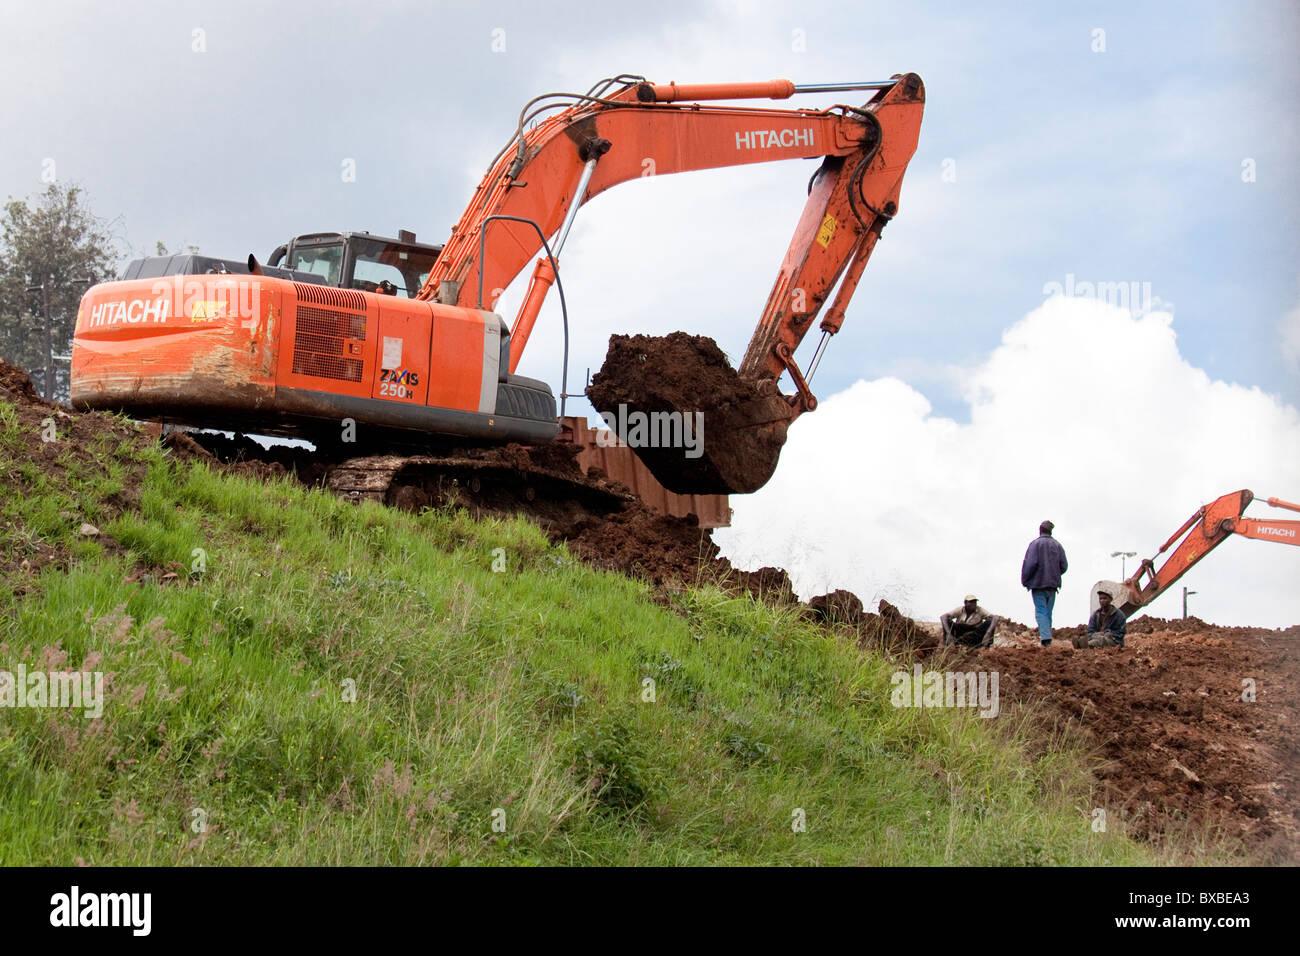 Excavator or digger heavy equipment working on highway construction in Nairobi, Kenya - Stock Image